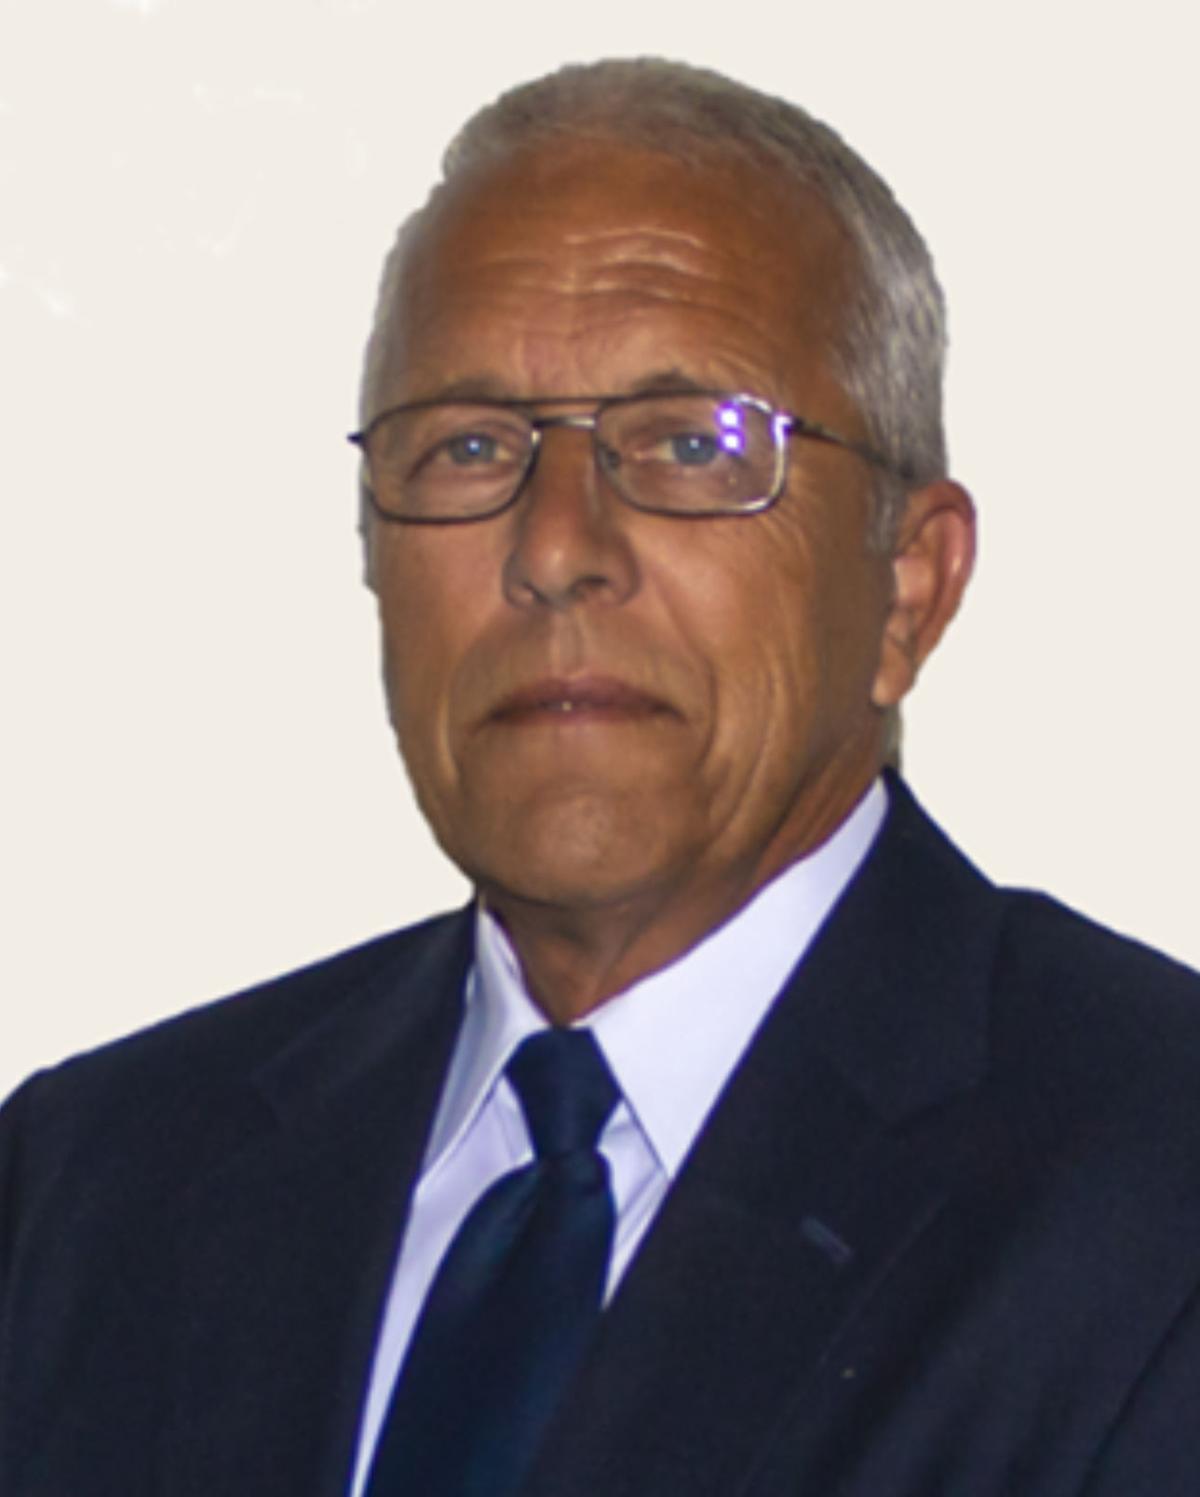 Michael Fisher